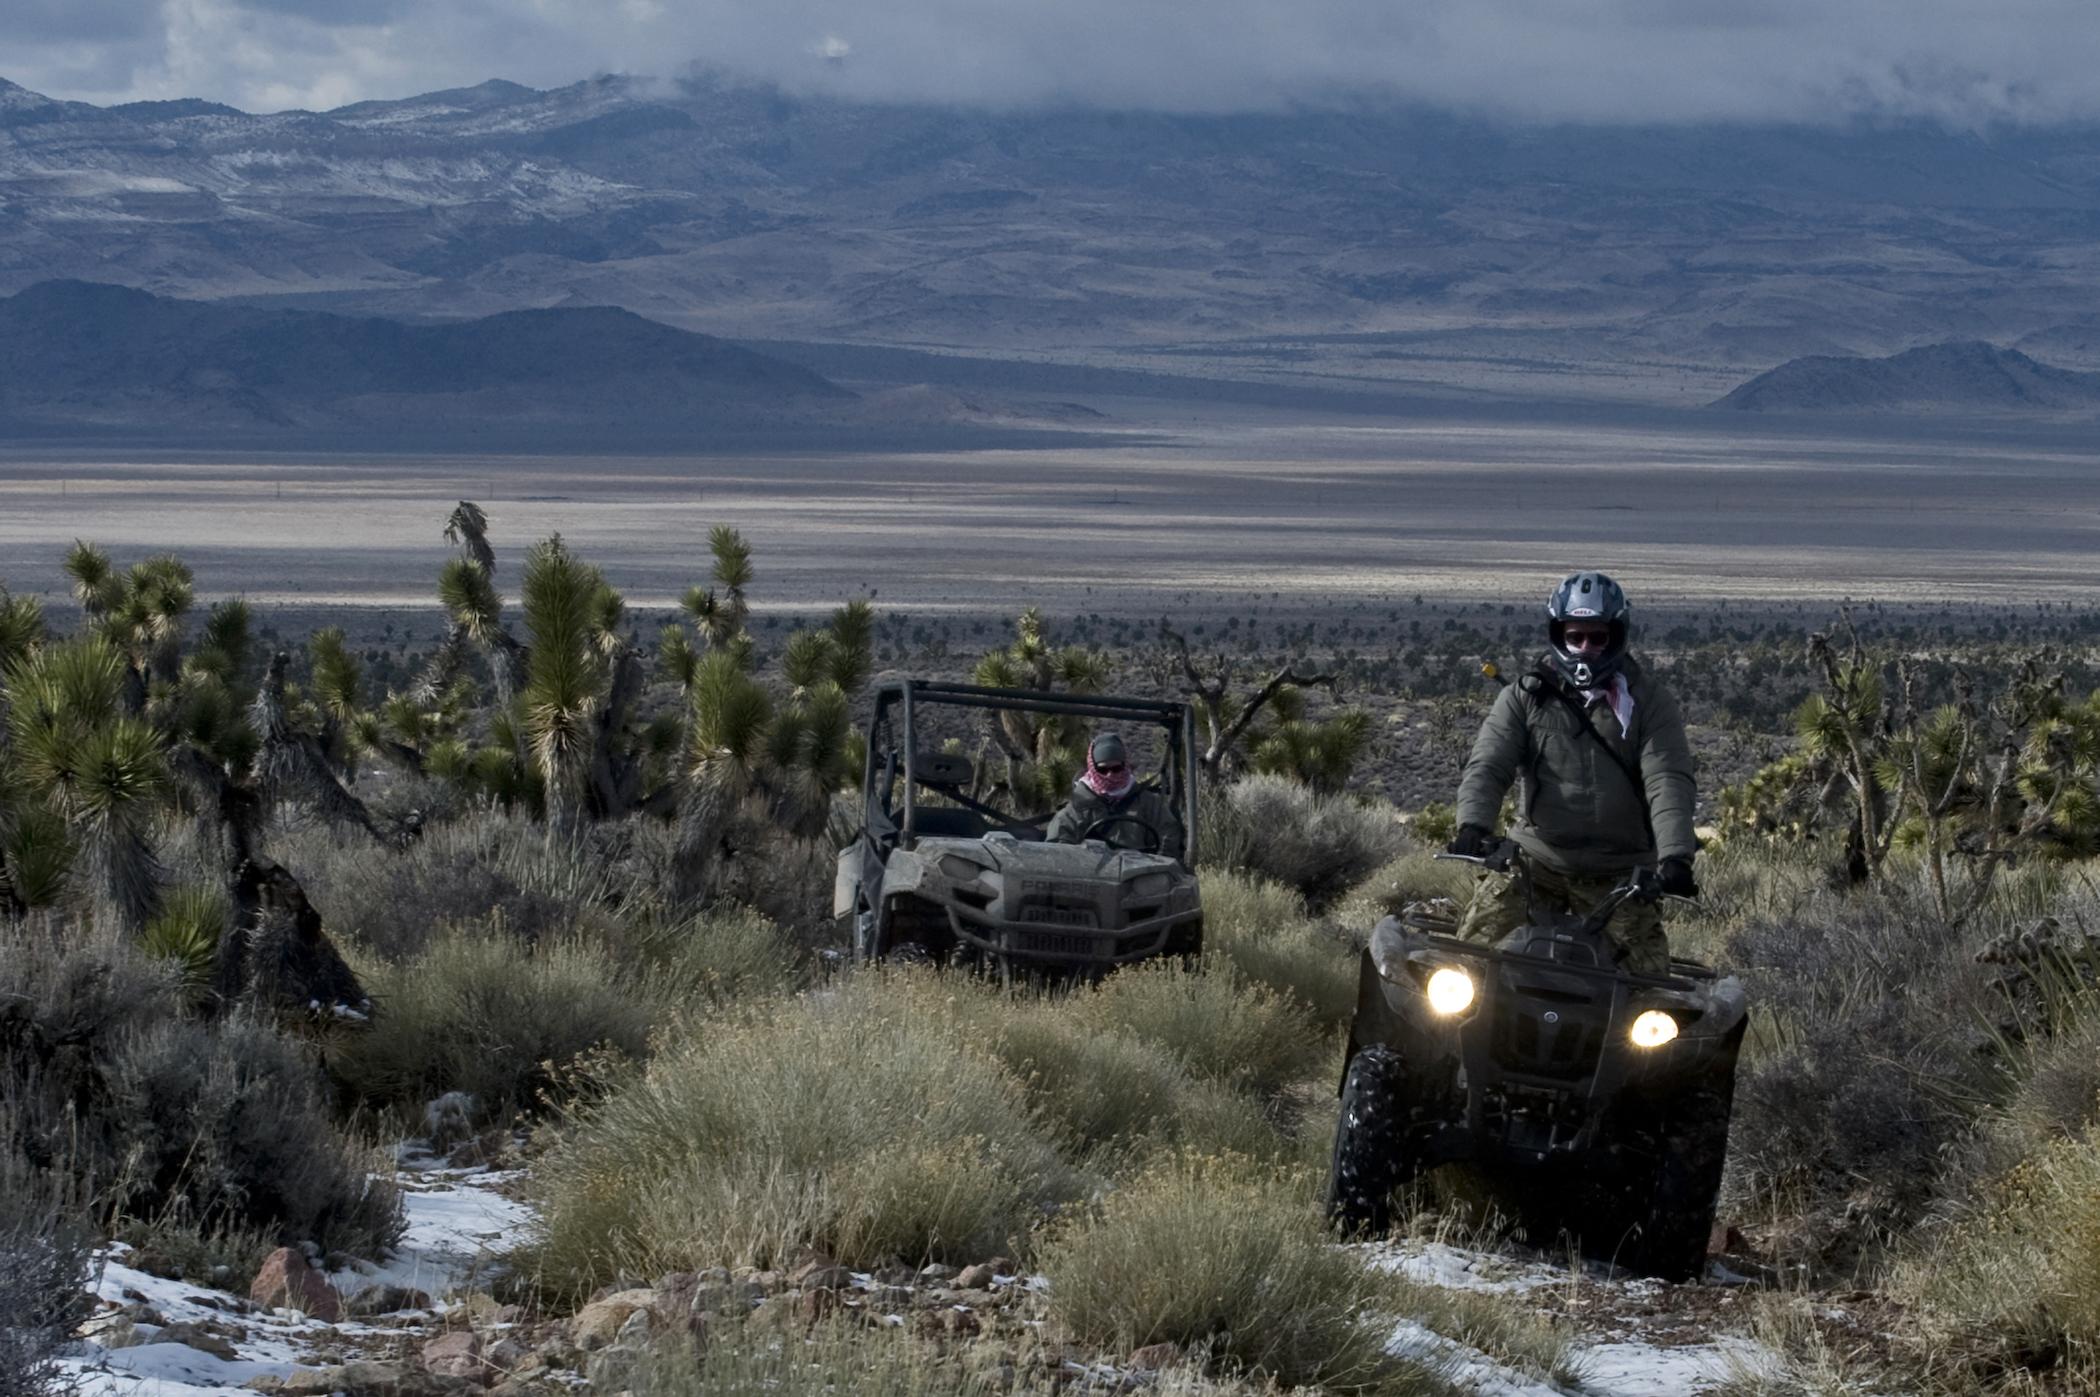 Квадроциклы едут по пустыни фото